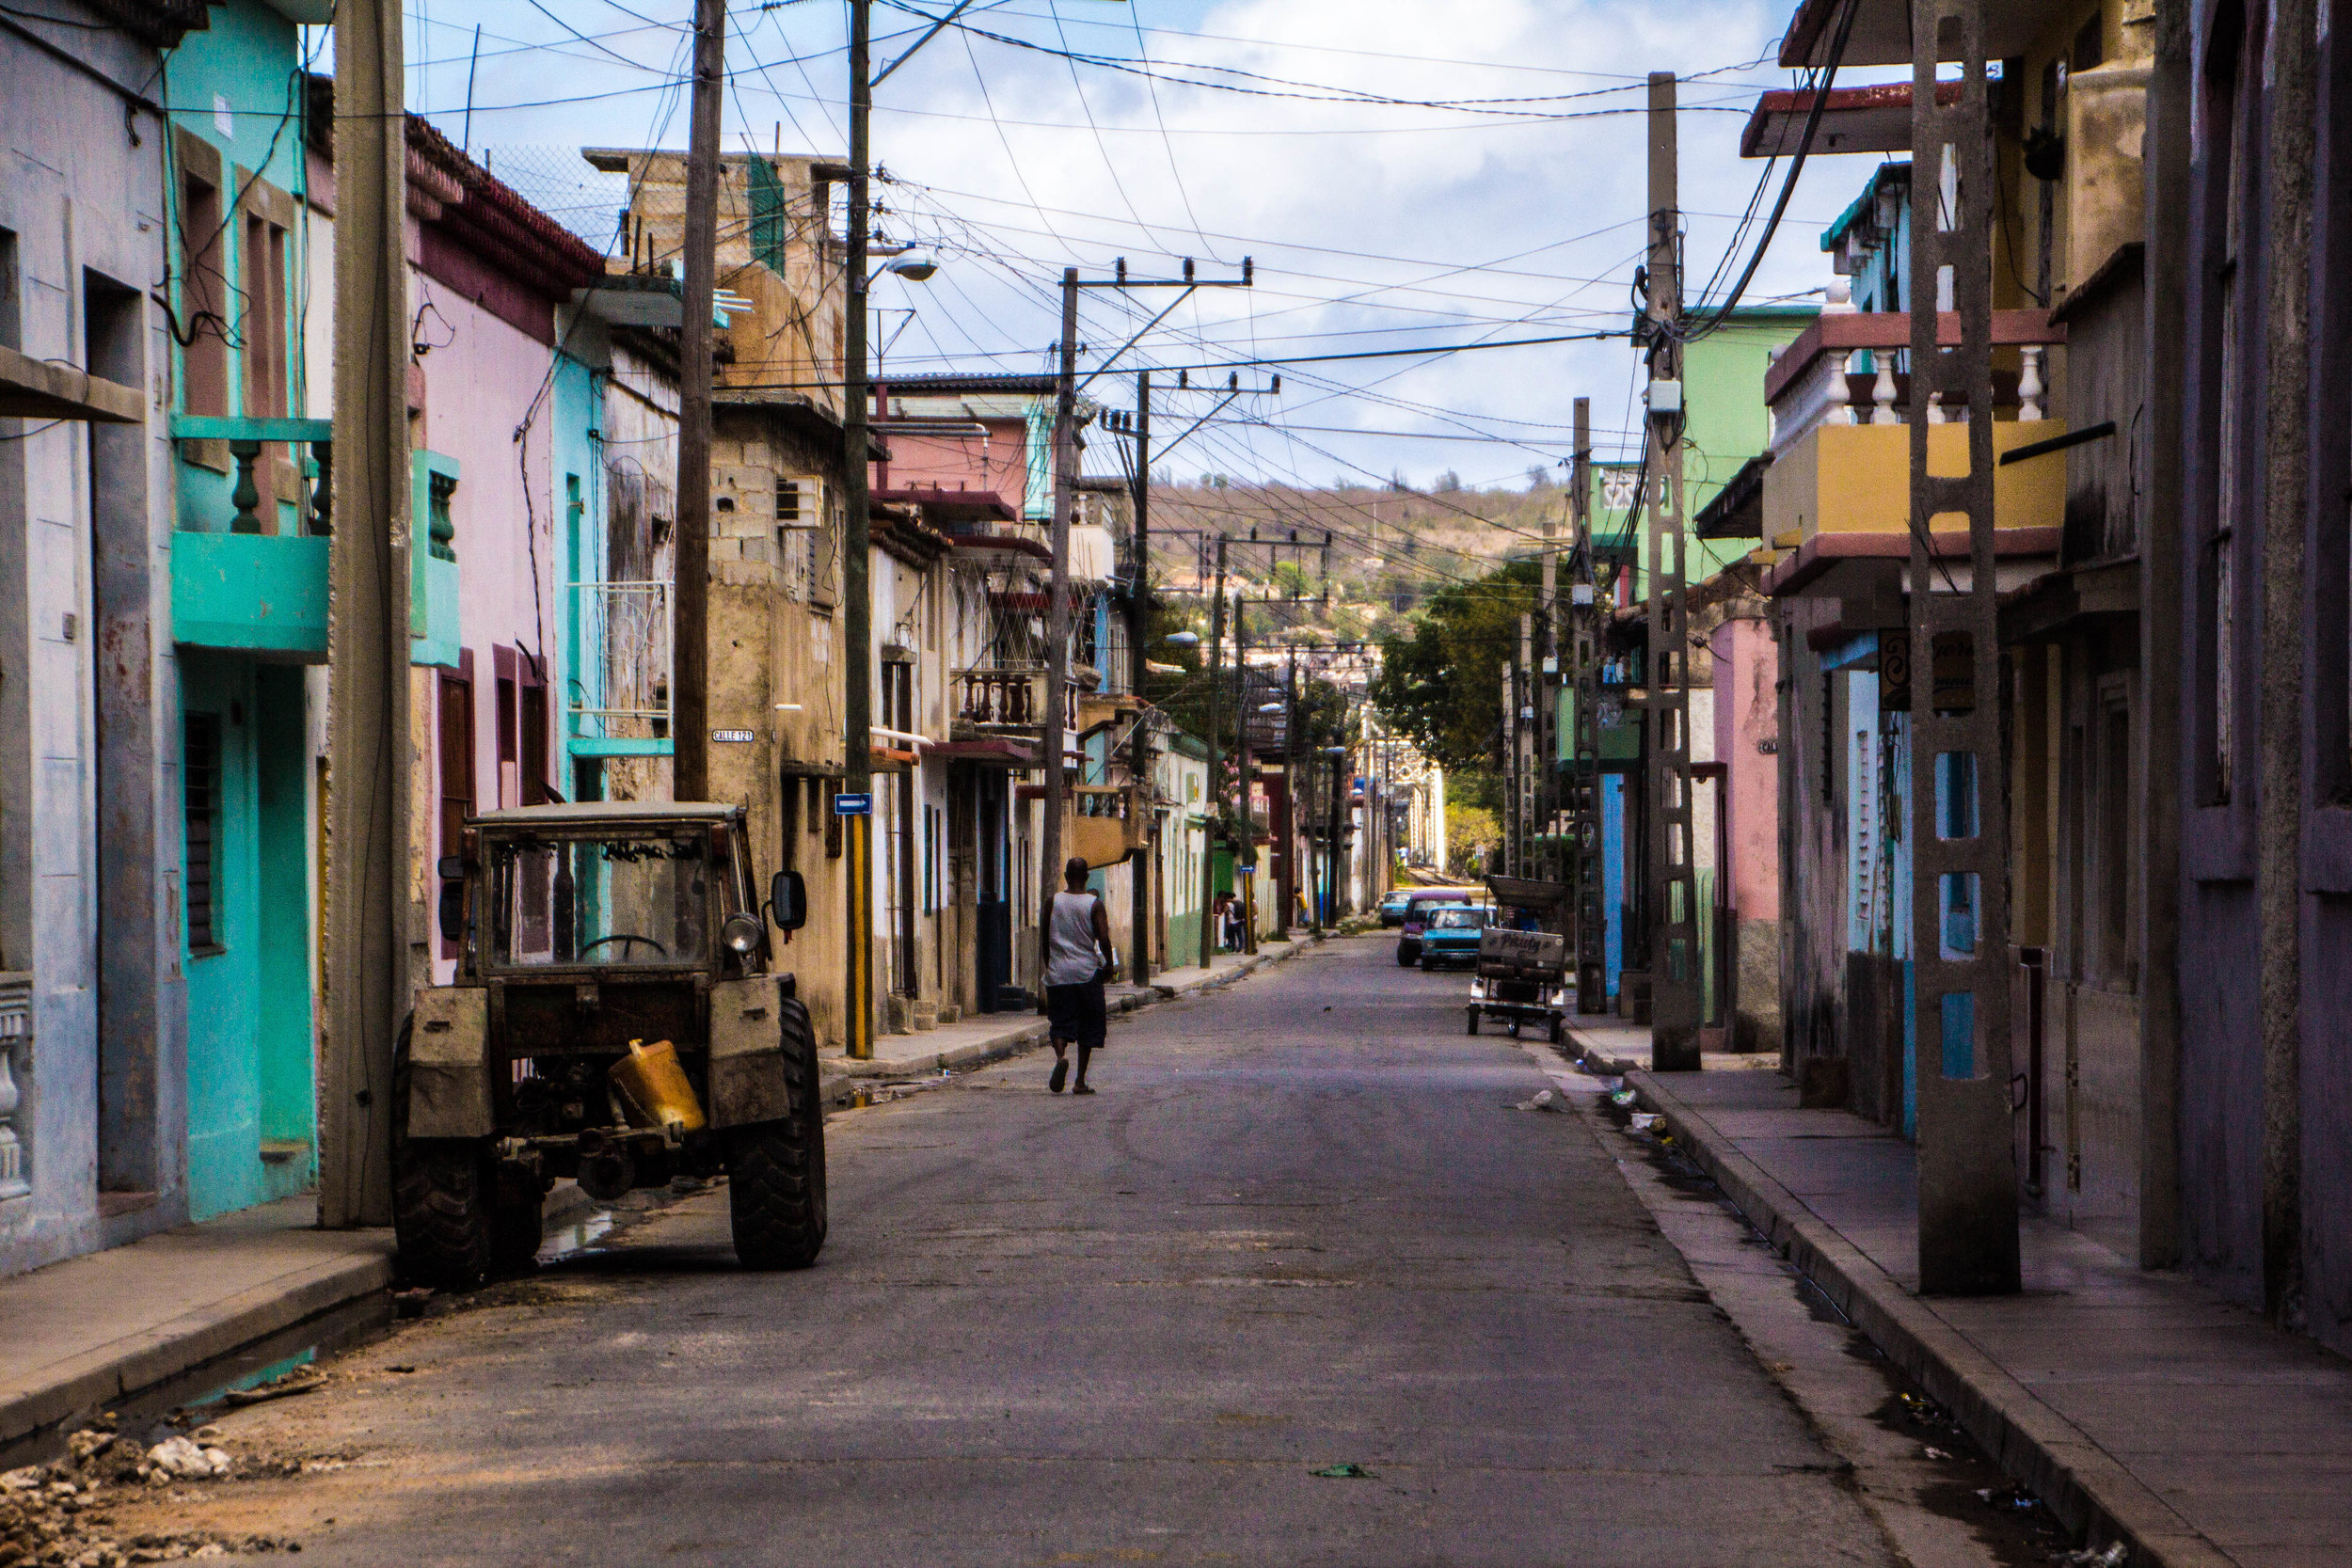 streets matanzas cuba-1-5-2.jpg